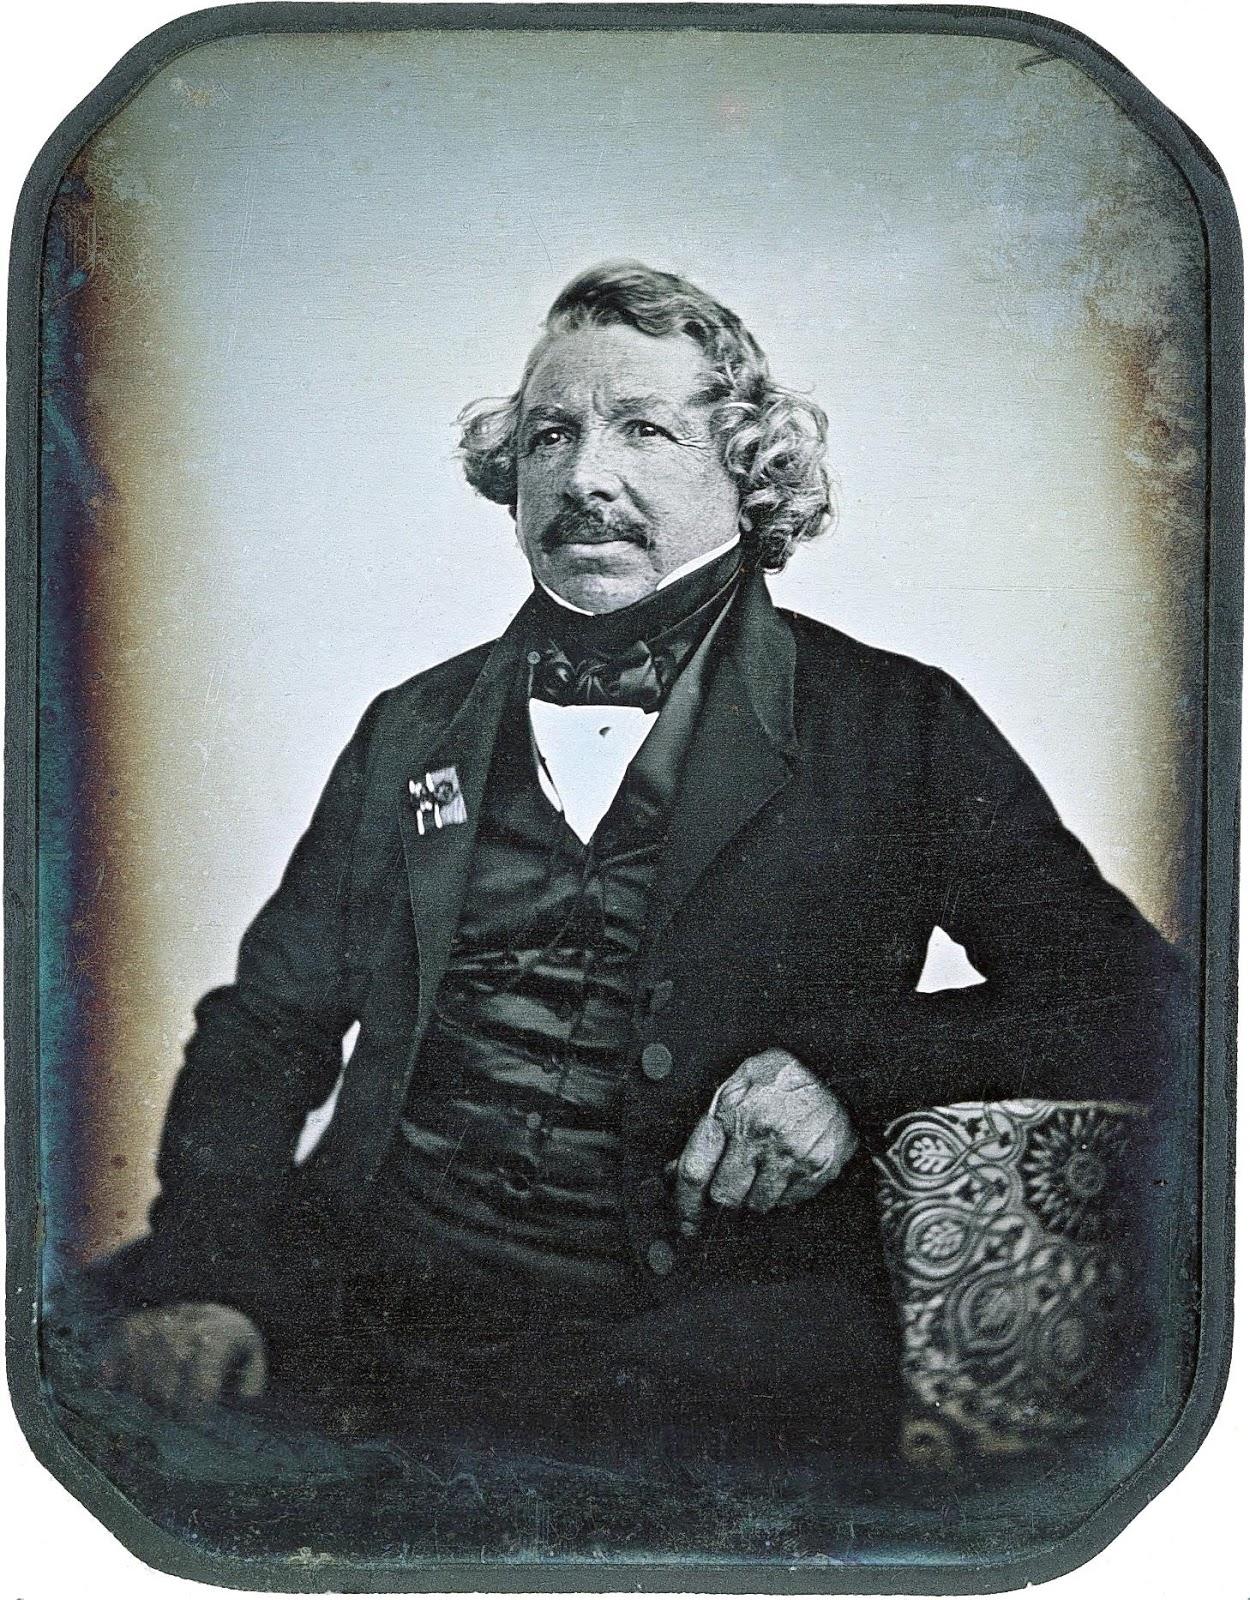 louis-daguerre-daguerreotype-portrait-1844-by-jean-baptiste-sabatier-blot.jpg